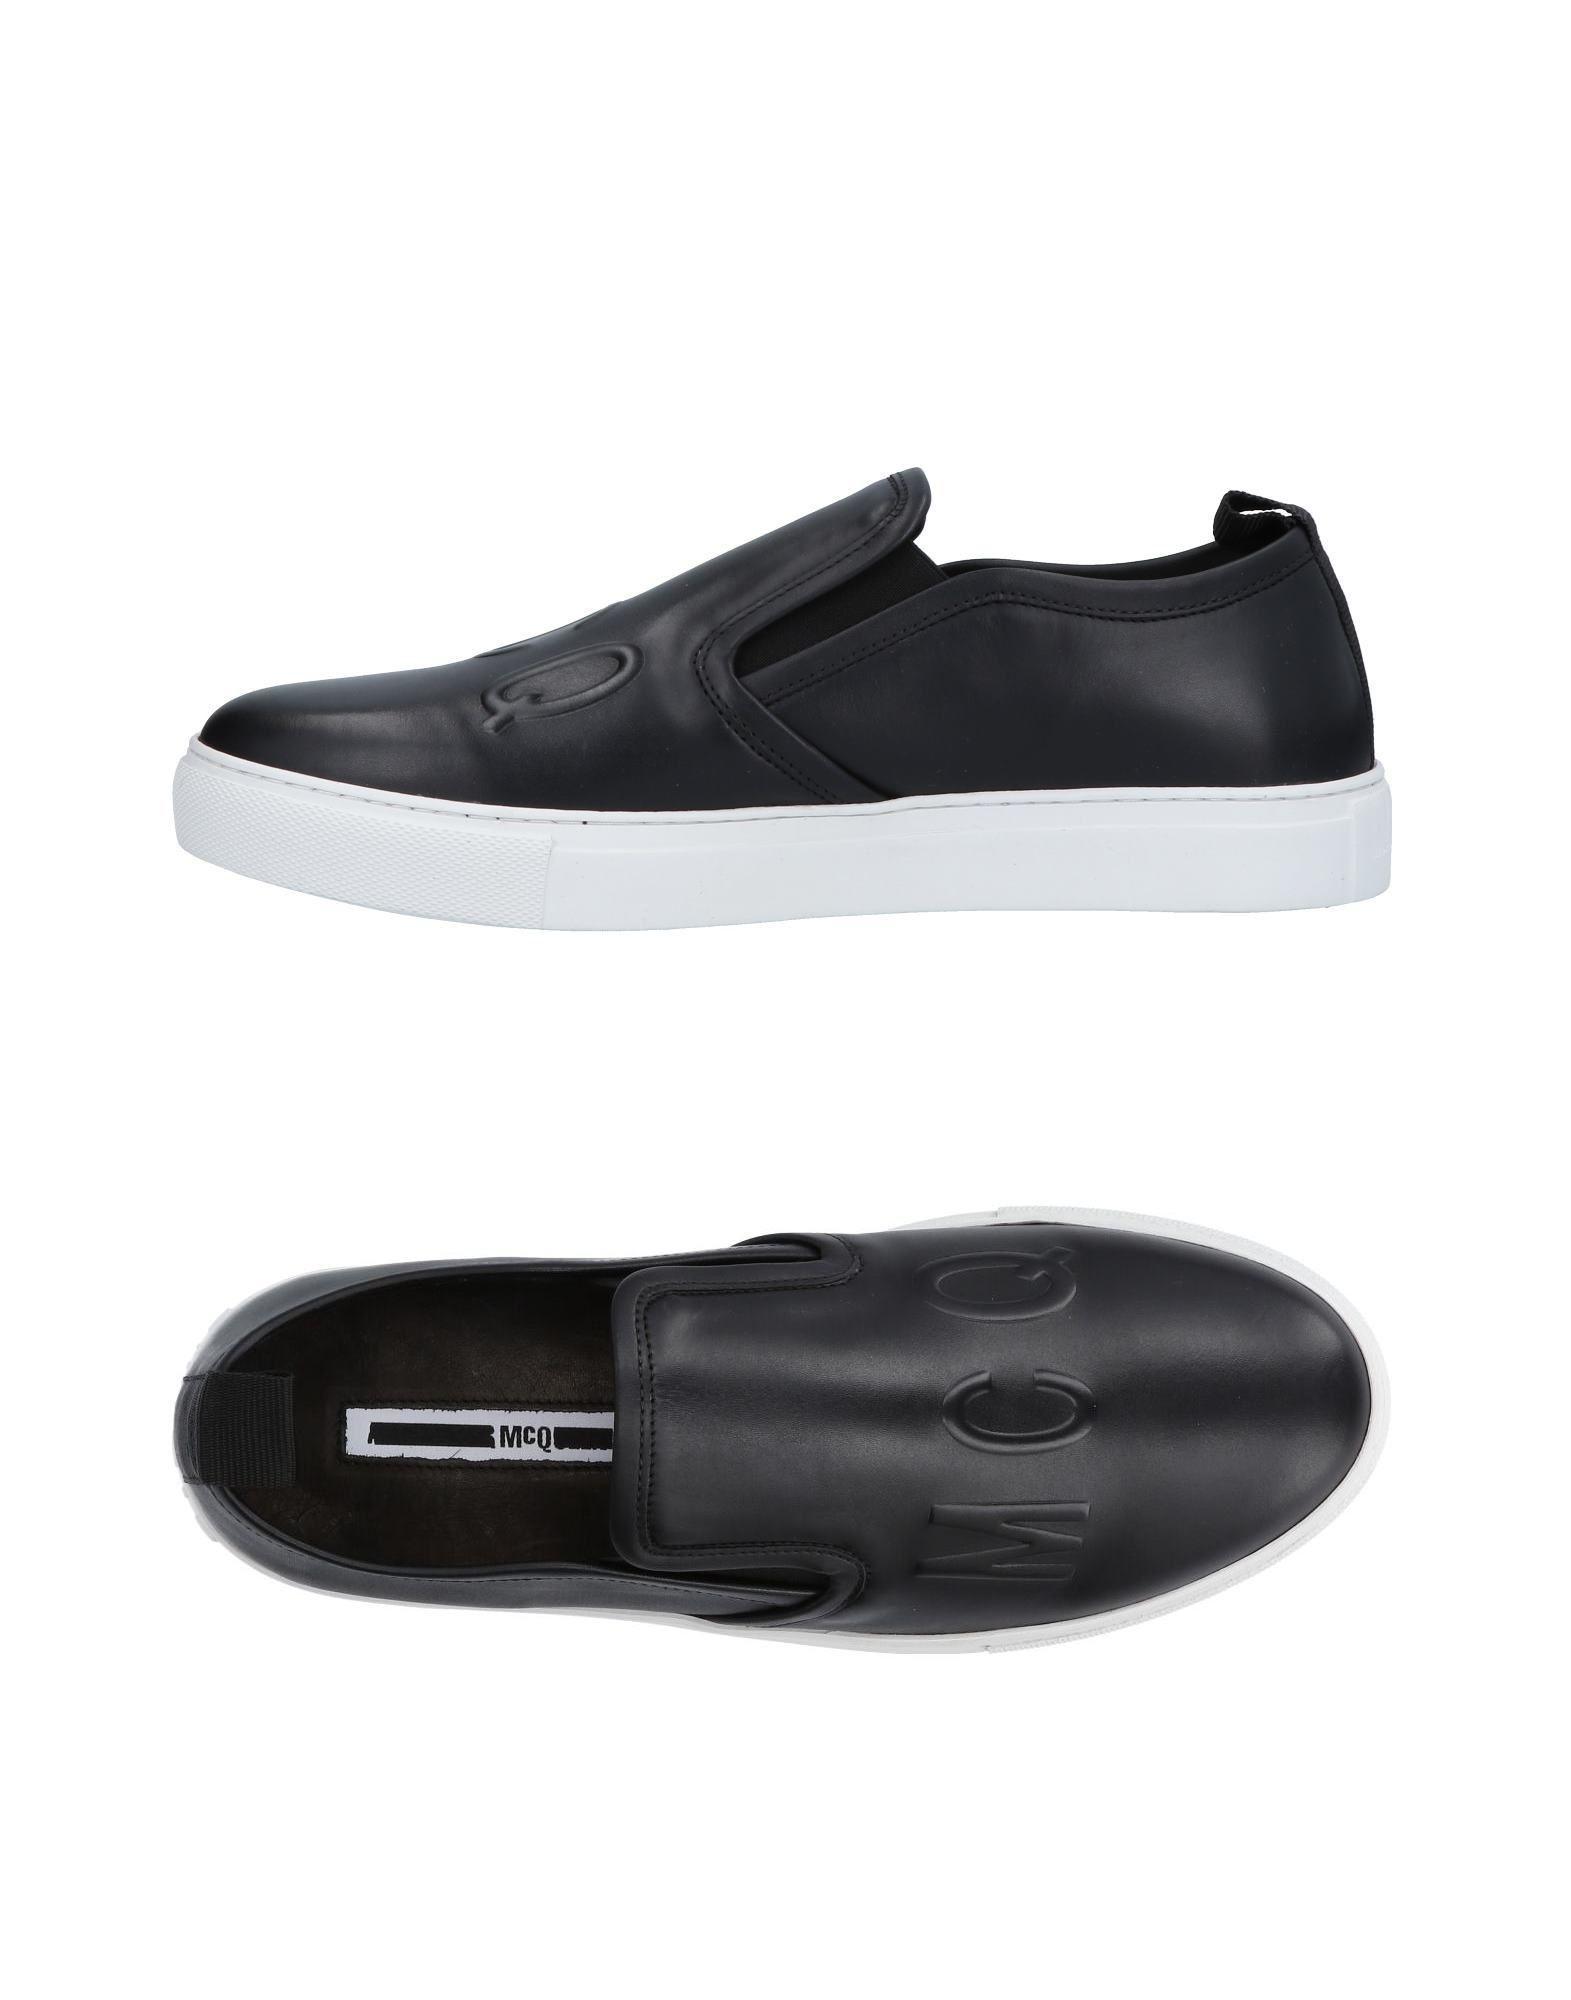 Mcq By Alexander Mcqueen Sneakers In Black